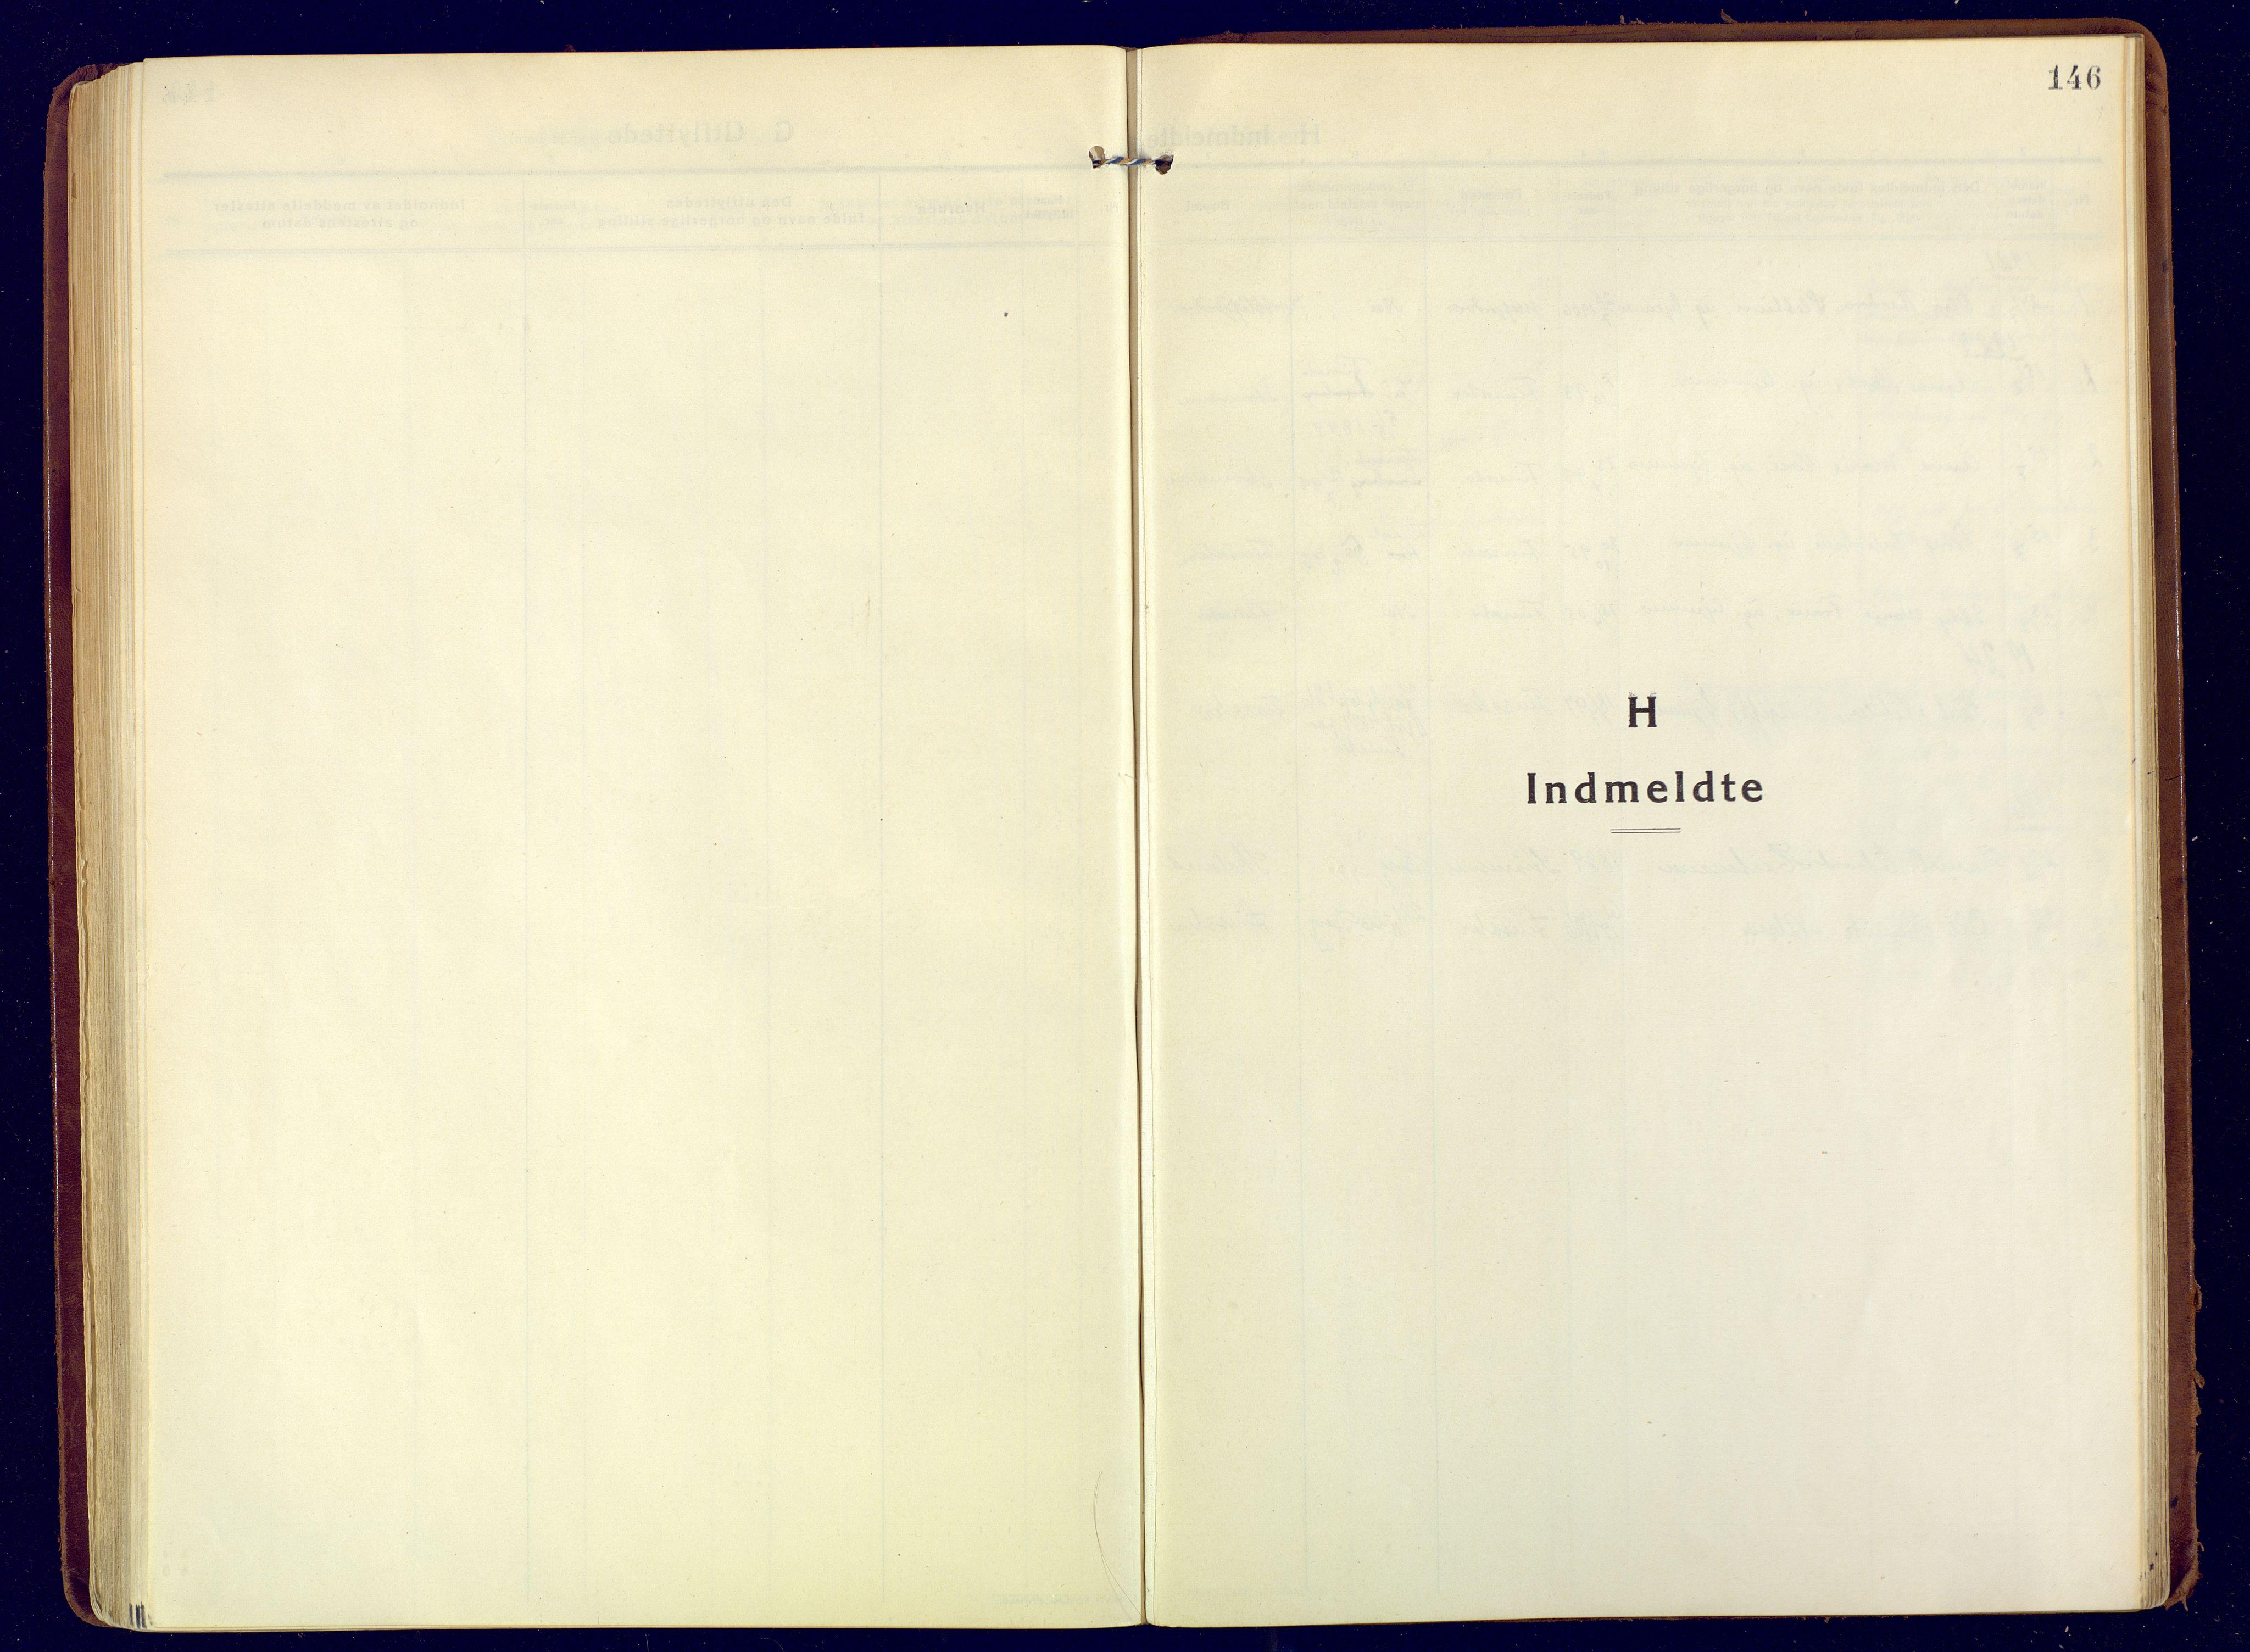 SATØ, Mefjord/Berg sokneprestkontor, G/Ga/Gaa: Ministerialbok nr. 9, 1916-1928, s. 146